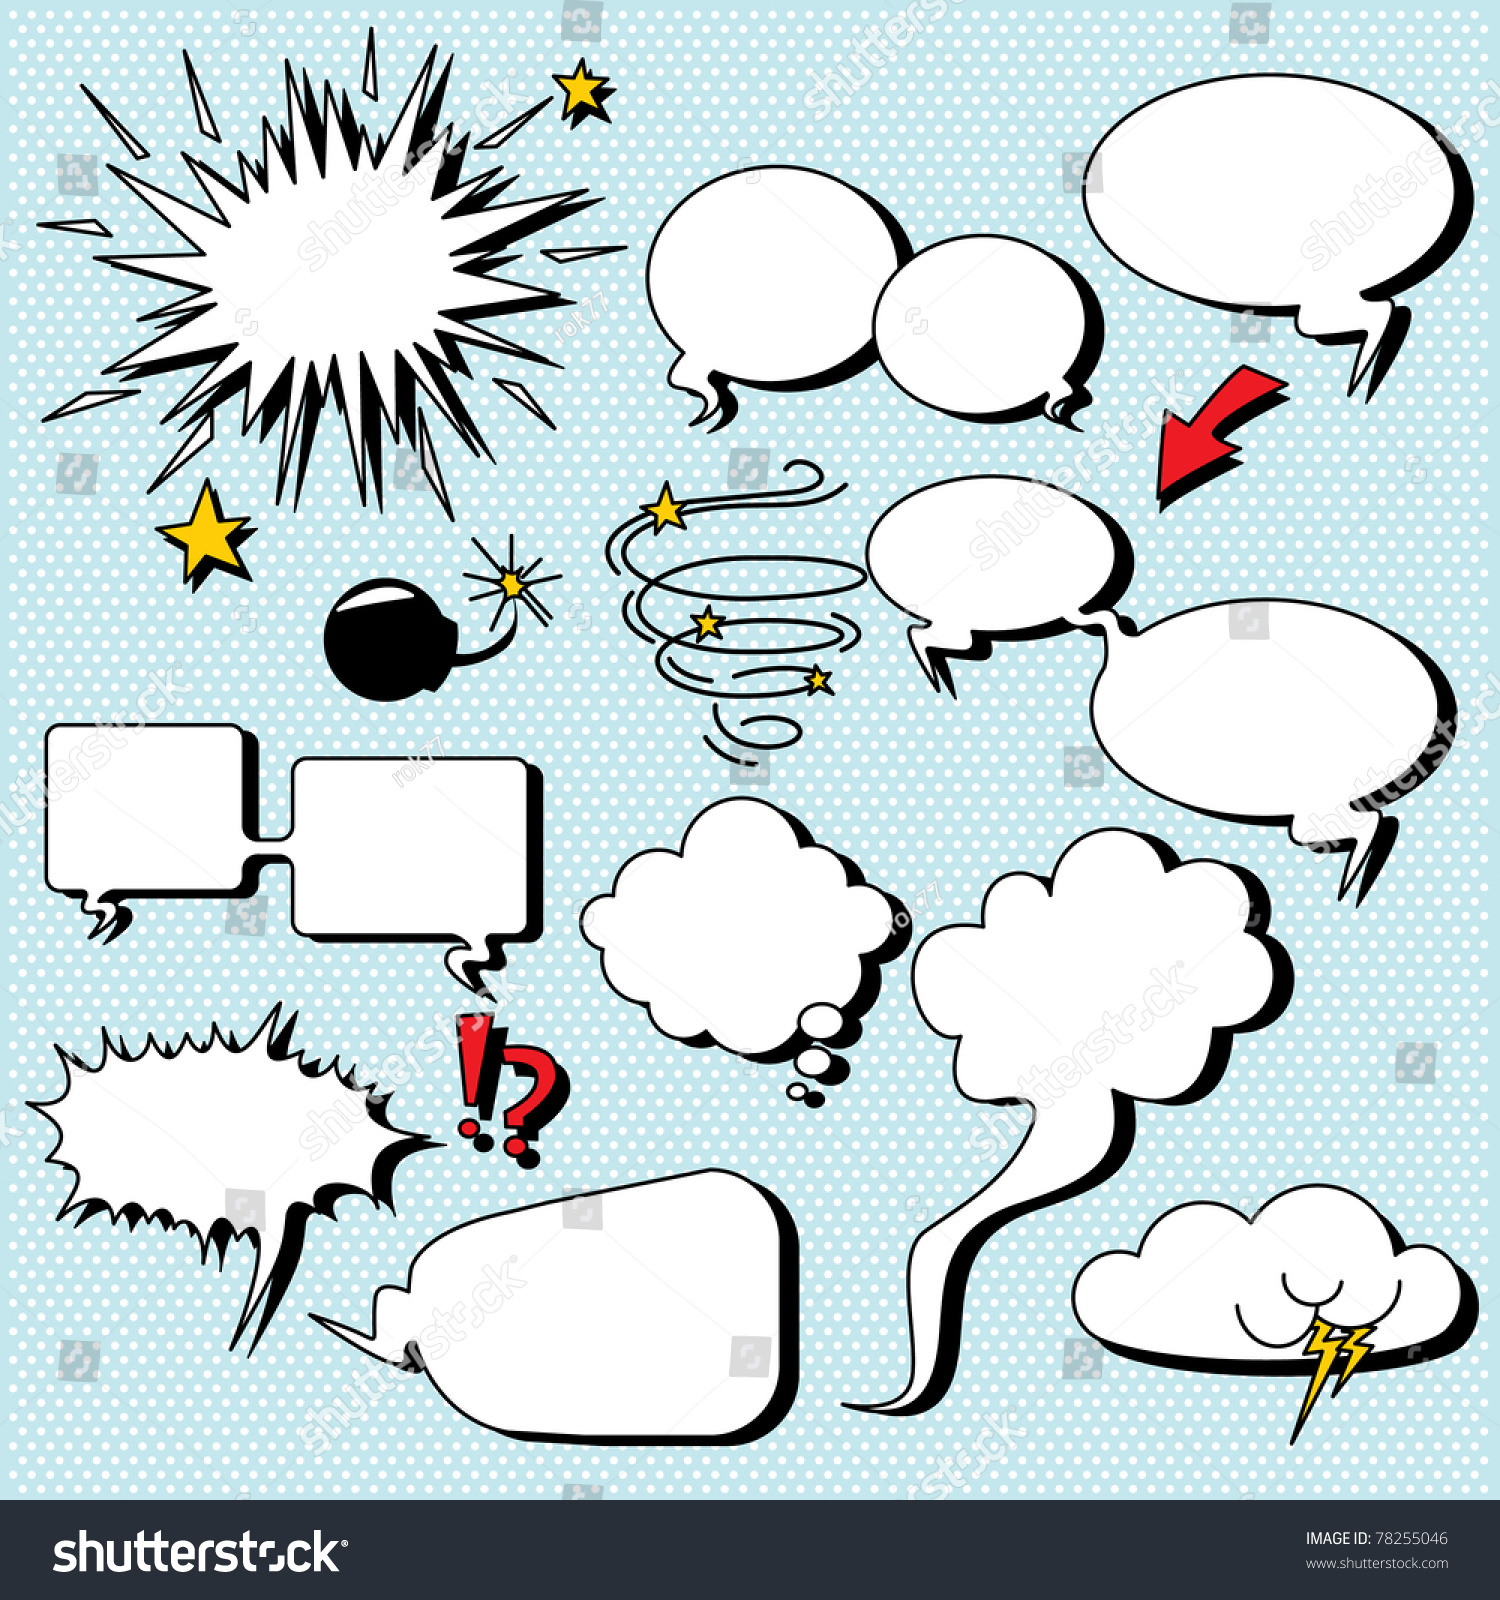 Comic Speech Bubbles Illustrations Comiccartoon Style Stock Vector ...